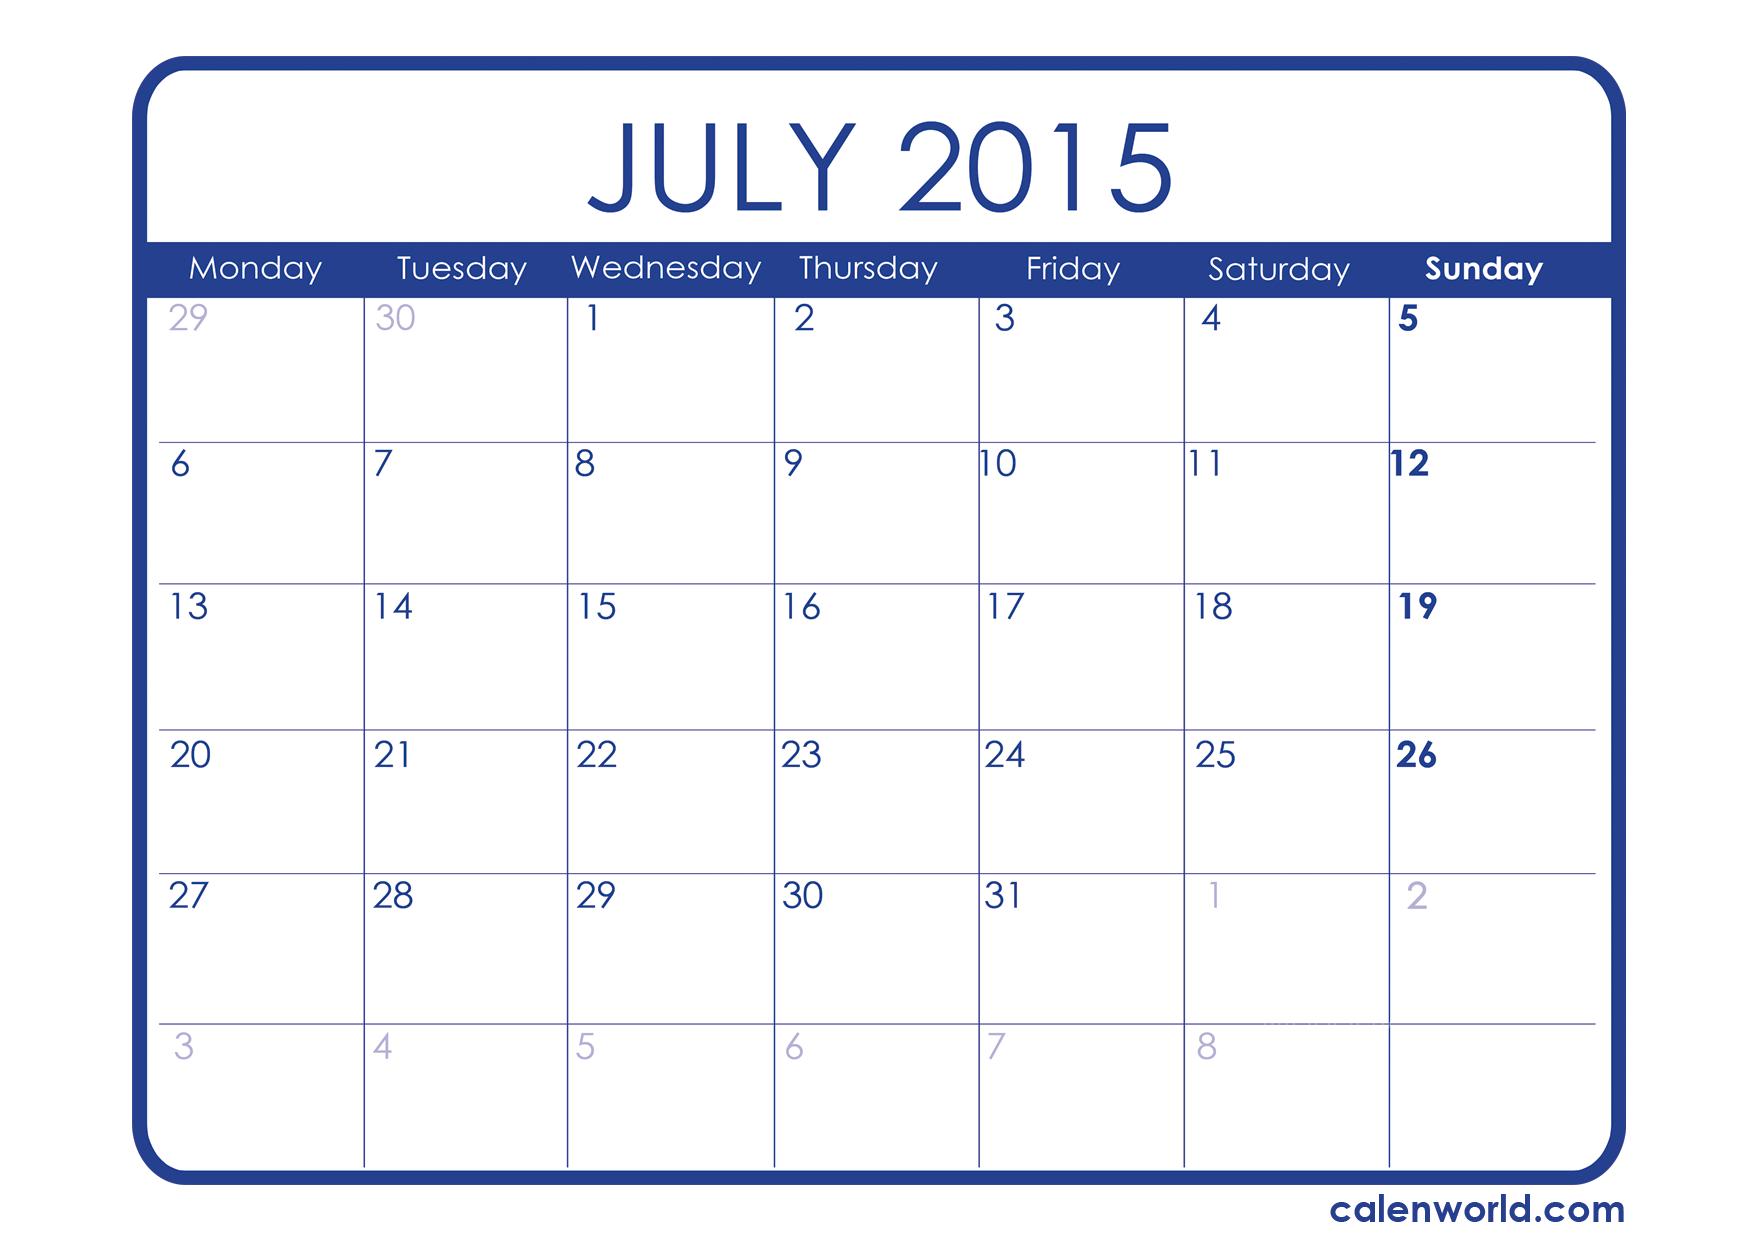 July free calendar clipart picture transparent 17 Best images about July 2015 Calendar on Pinterest | Canada ... picture transparent